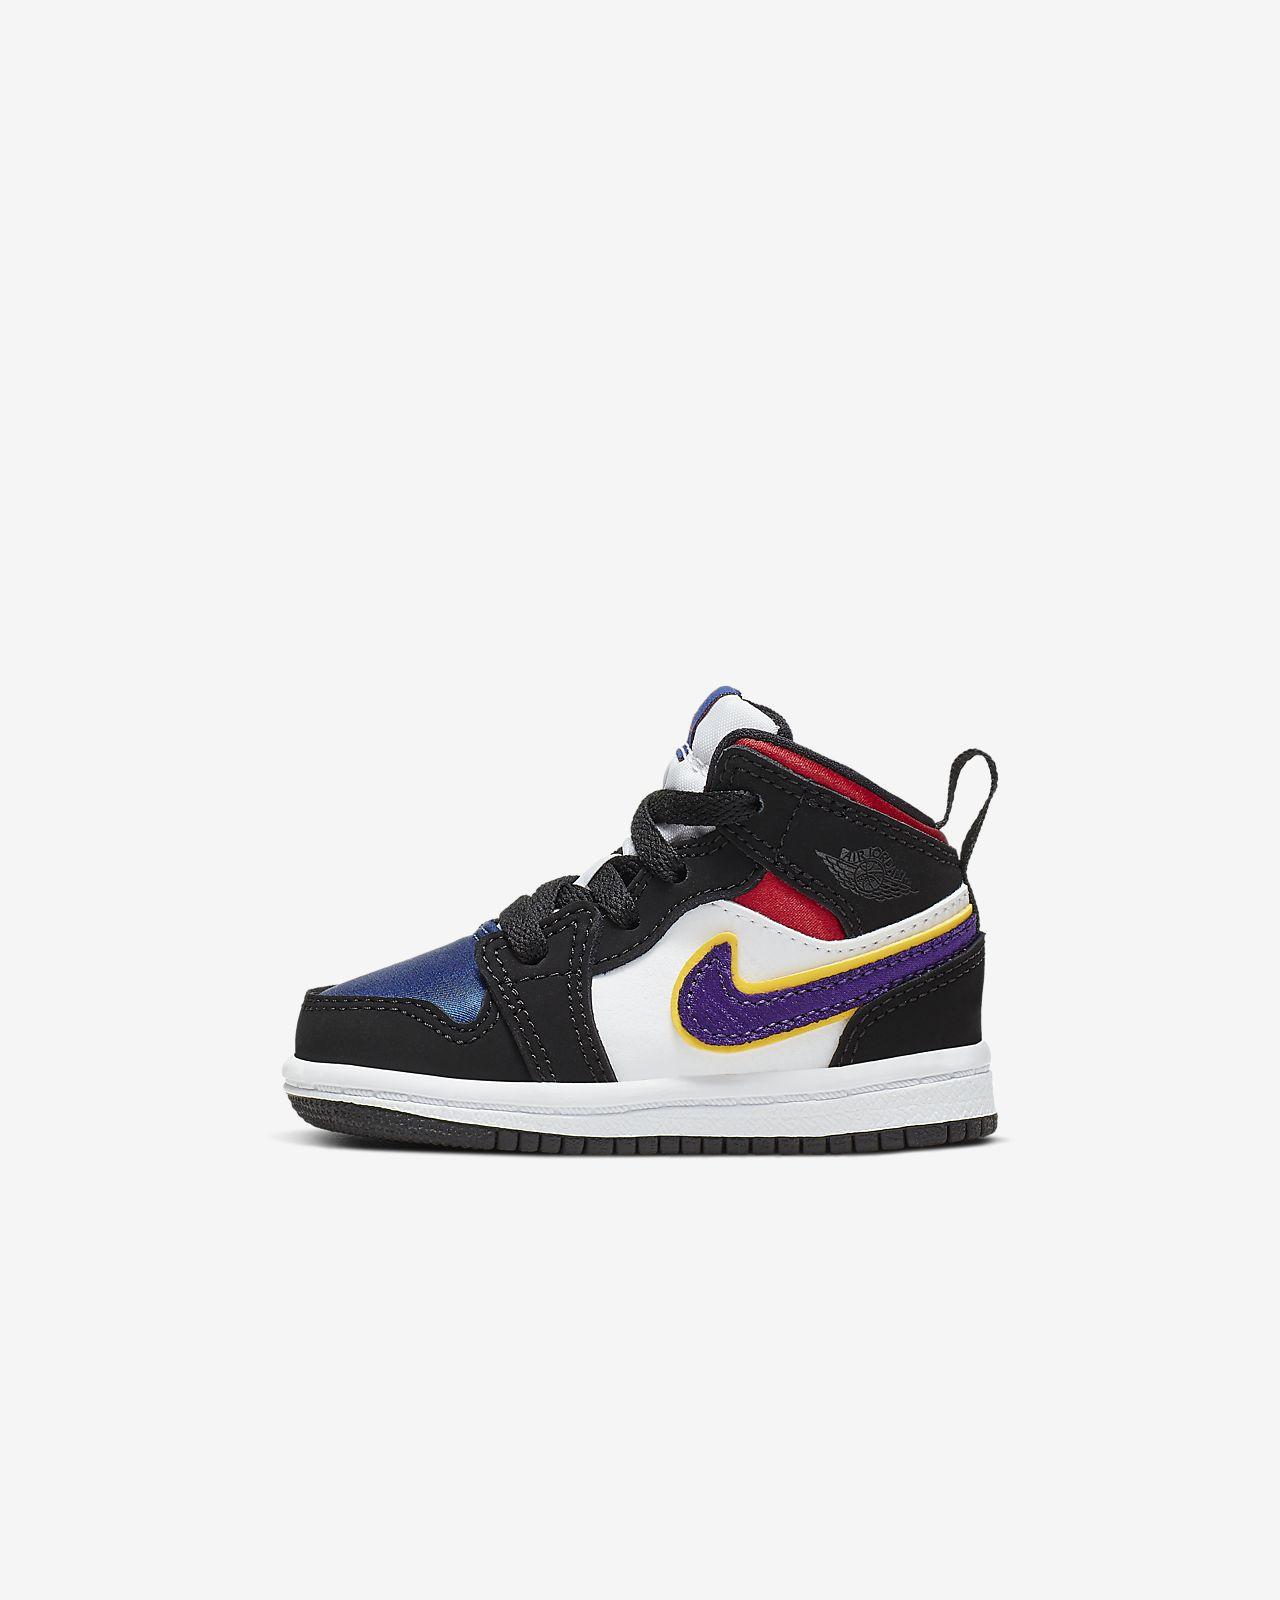 finest selection 0240f 4e176 Jordan 1 Mid SE Baby/Toddler Shoe